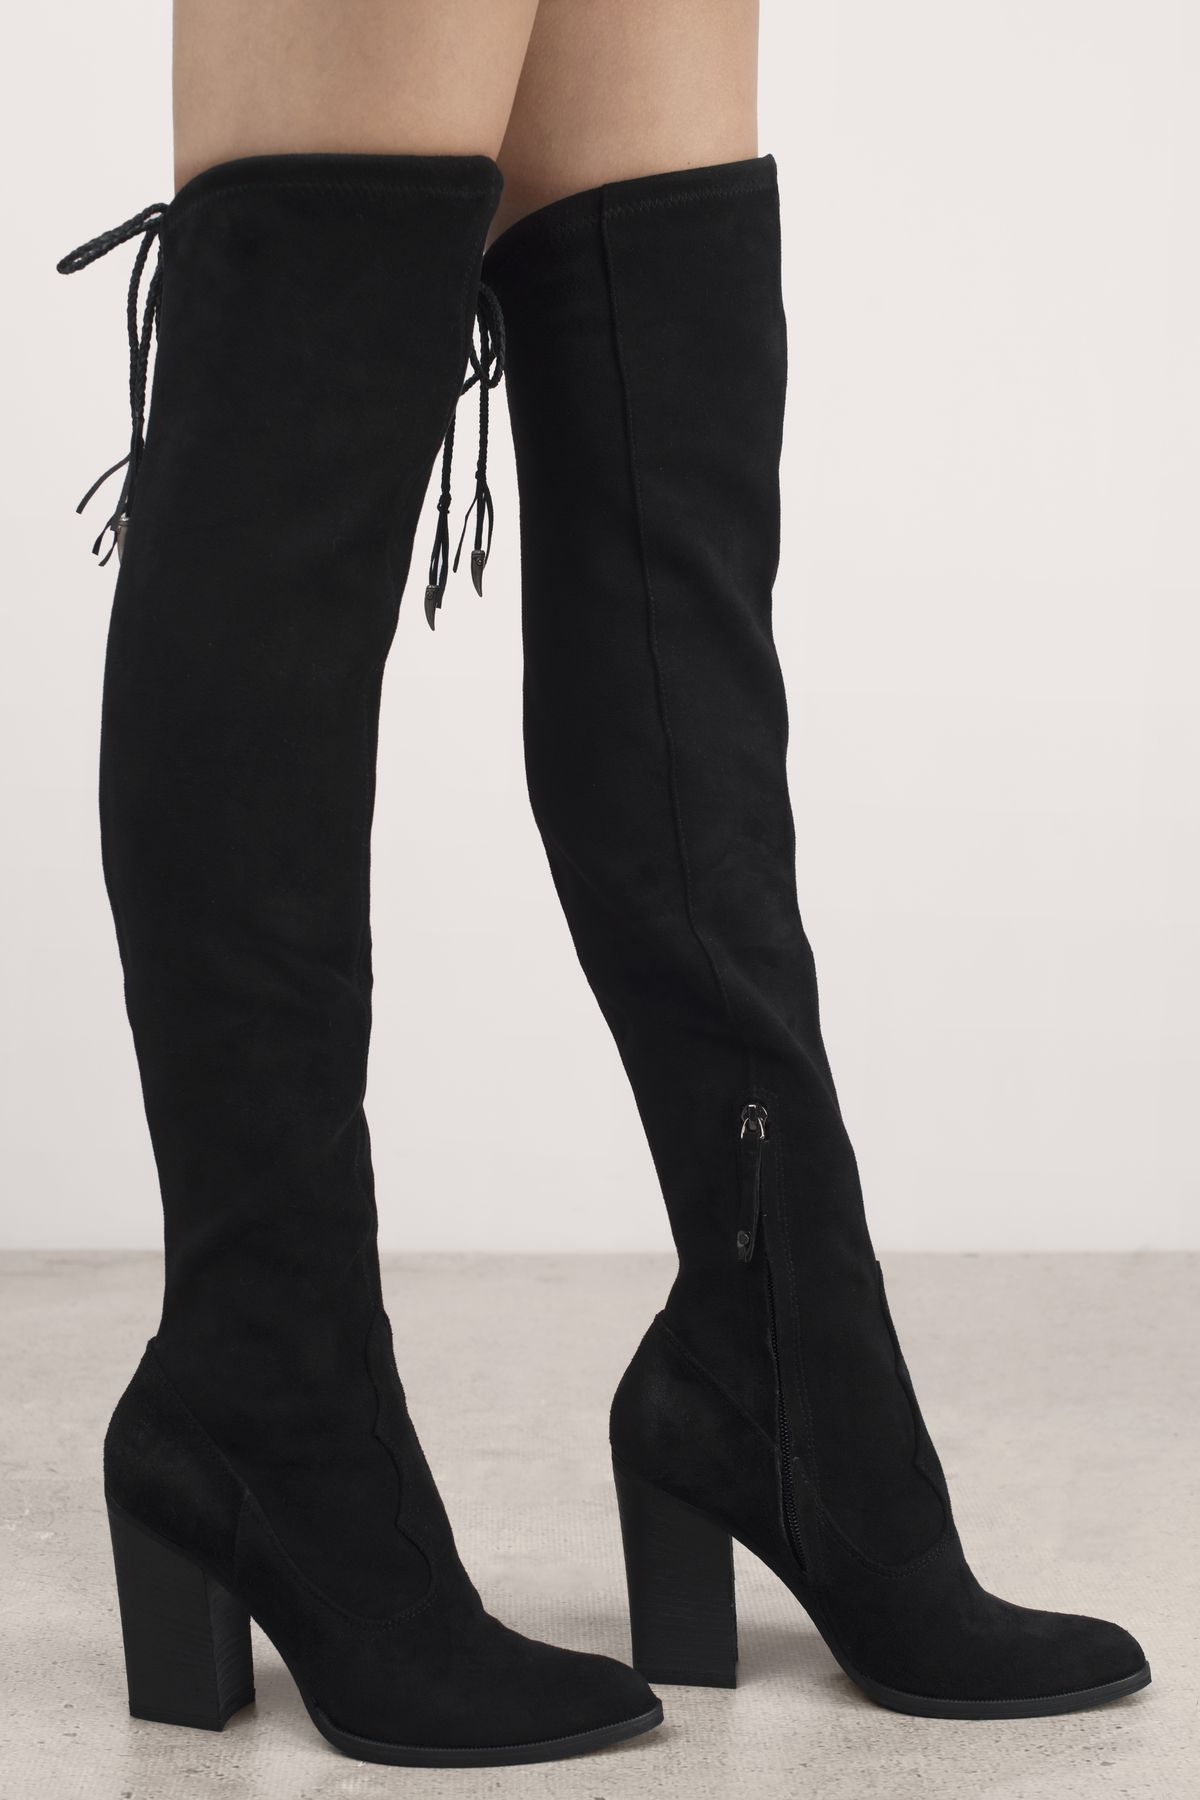 Chance Knee High Heeled Boots At Tobi Com Shoptobi High Heel Boots Knee Boots Thigh High Suede Boots